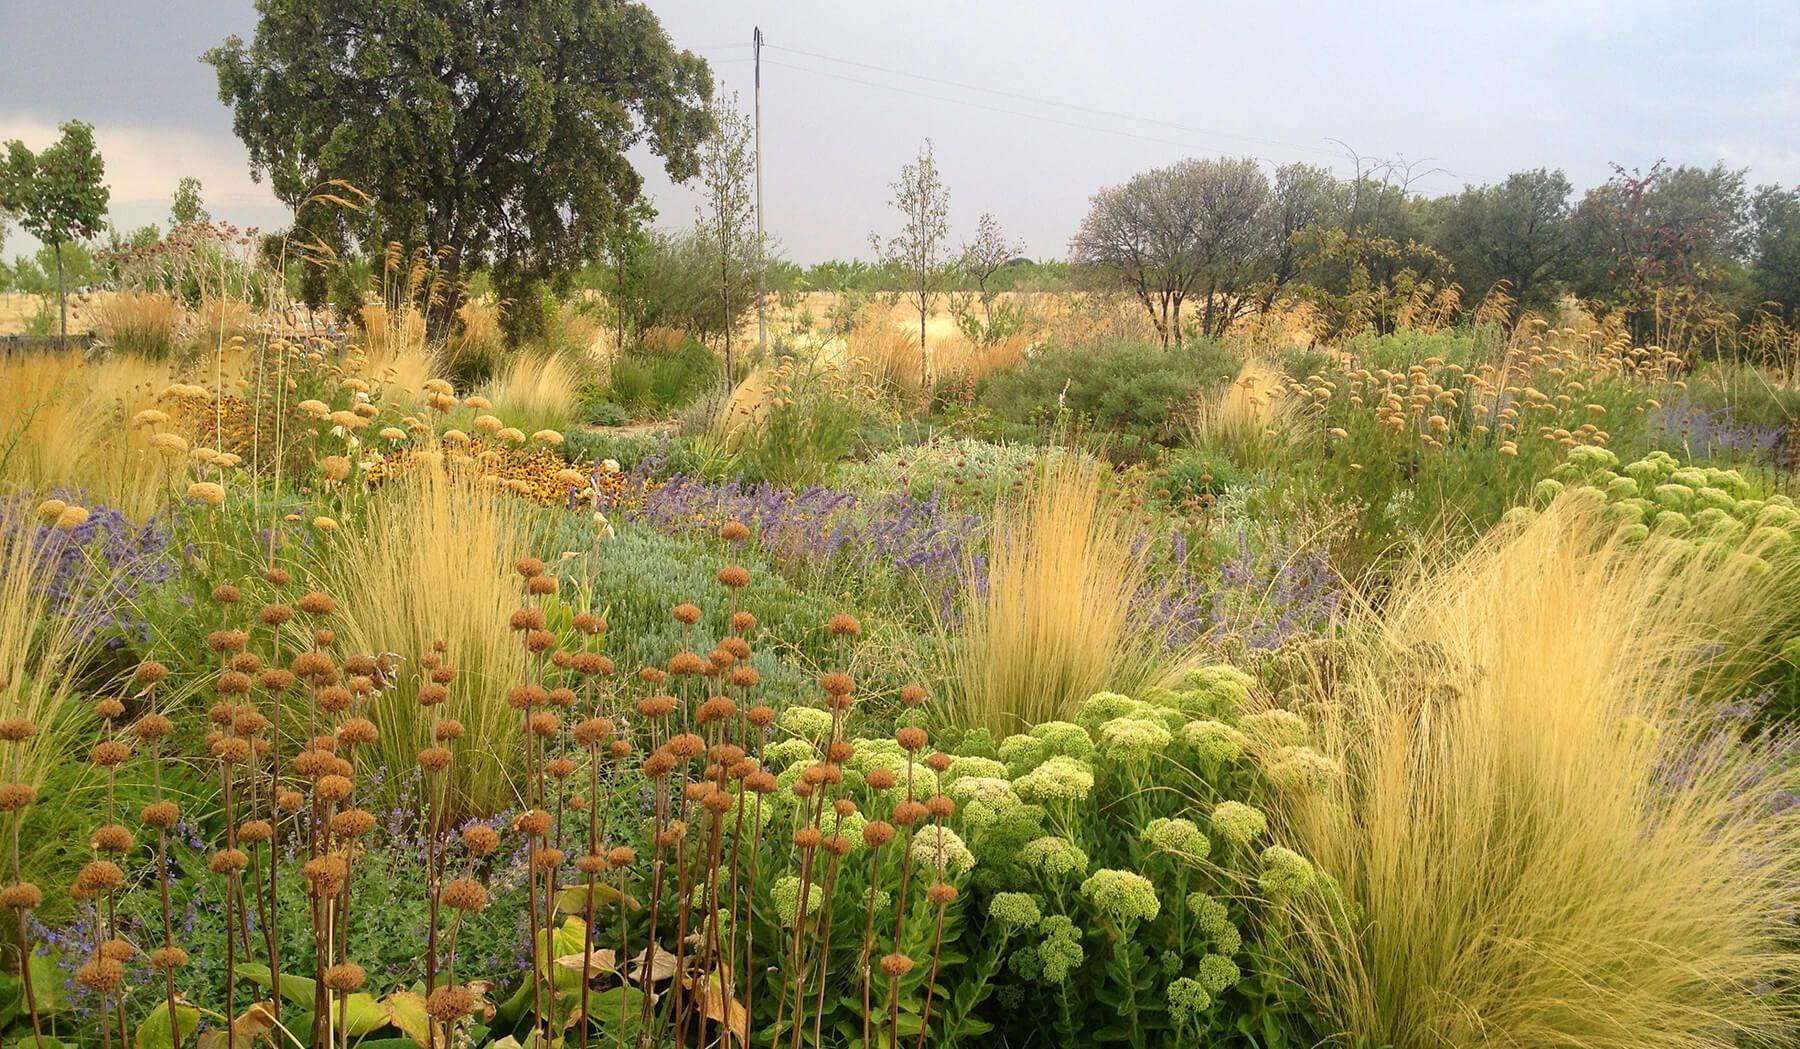 Landscape Gardening Course Cambridge Landscape Gardening Basingstoke Landscapegardeningdegree With Images Mediterranean Landscaping Dry Garden Drought Tolerant Garden